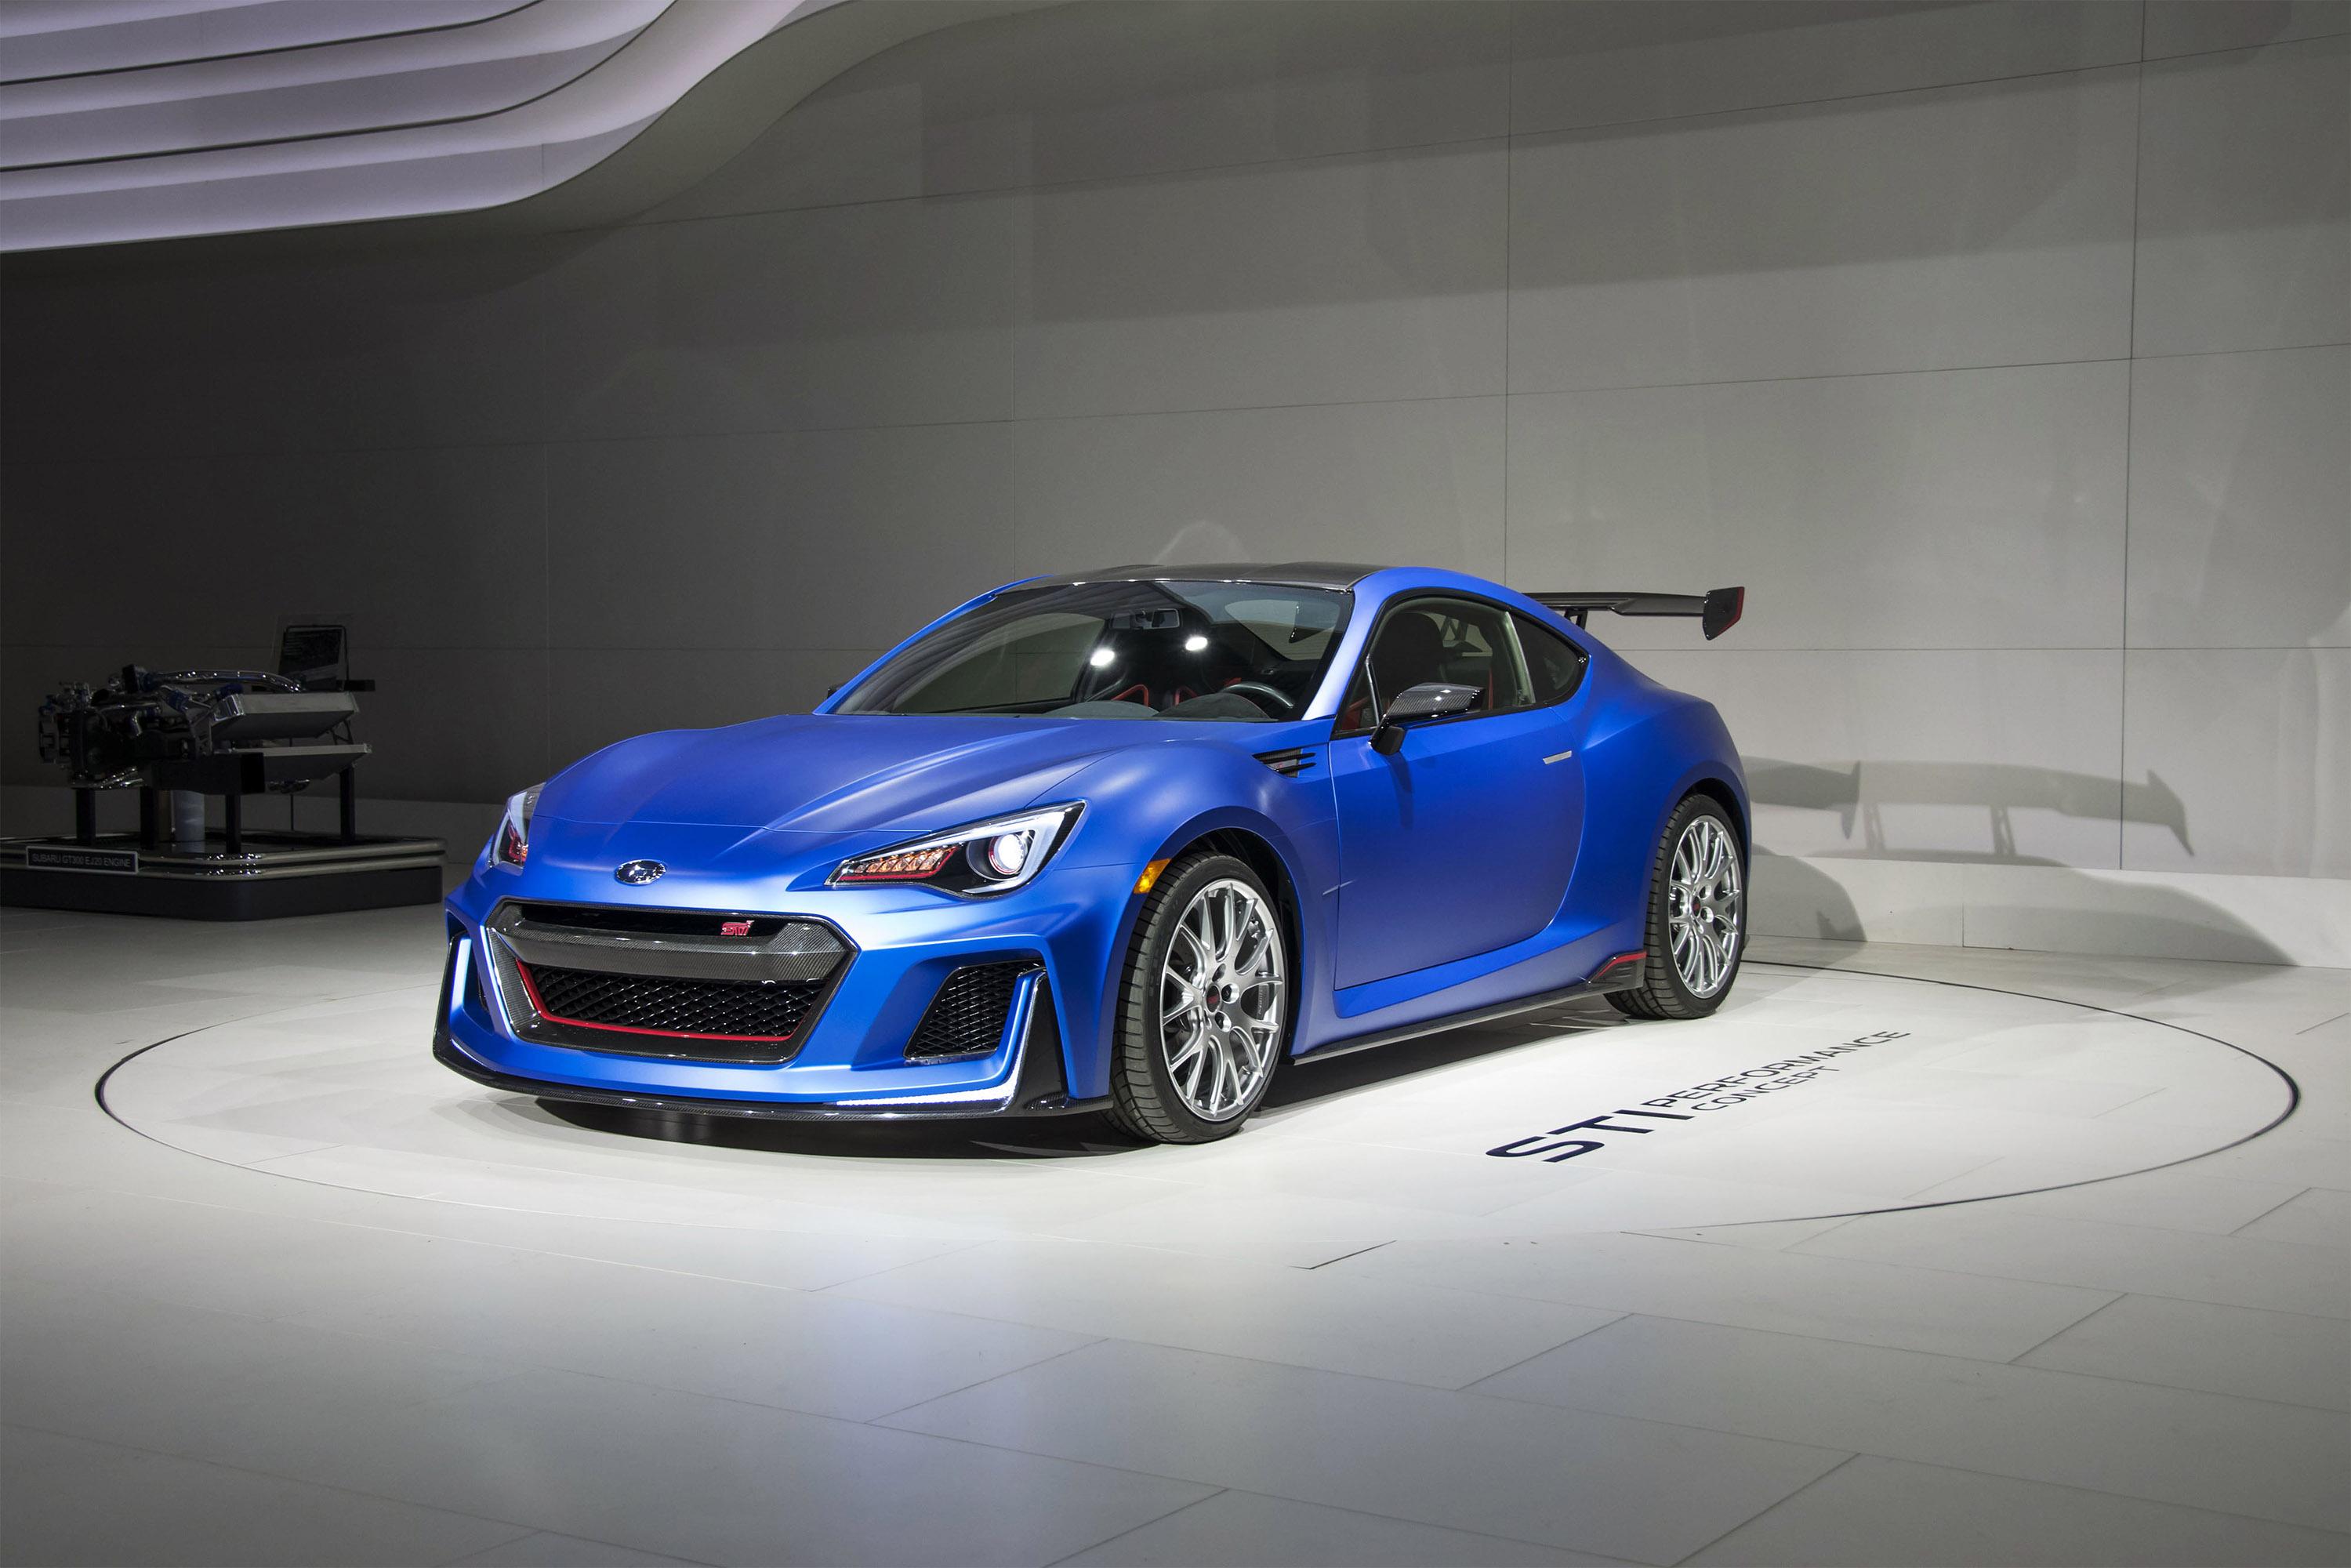 2015 Subaru Brz Sti Performance Concept Hd Pictures